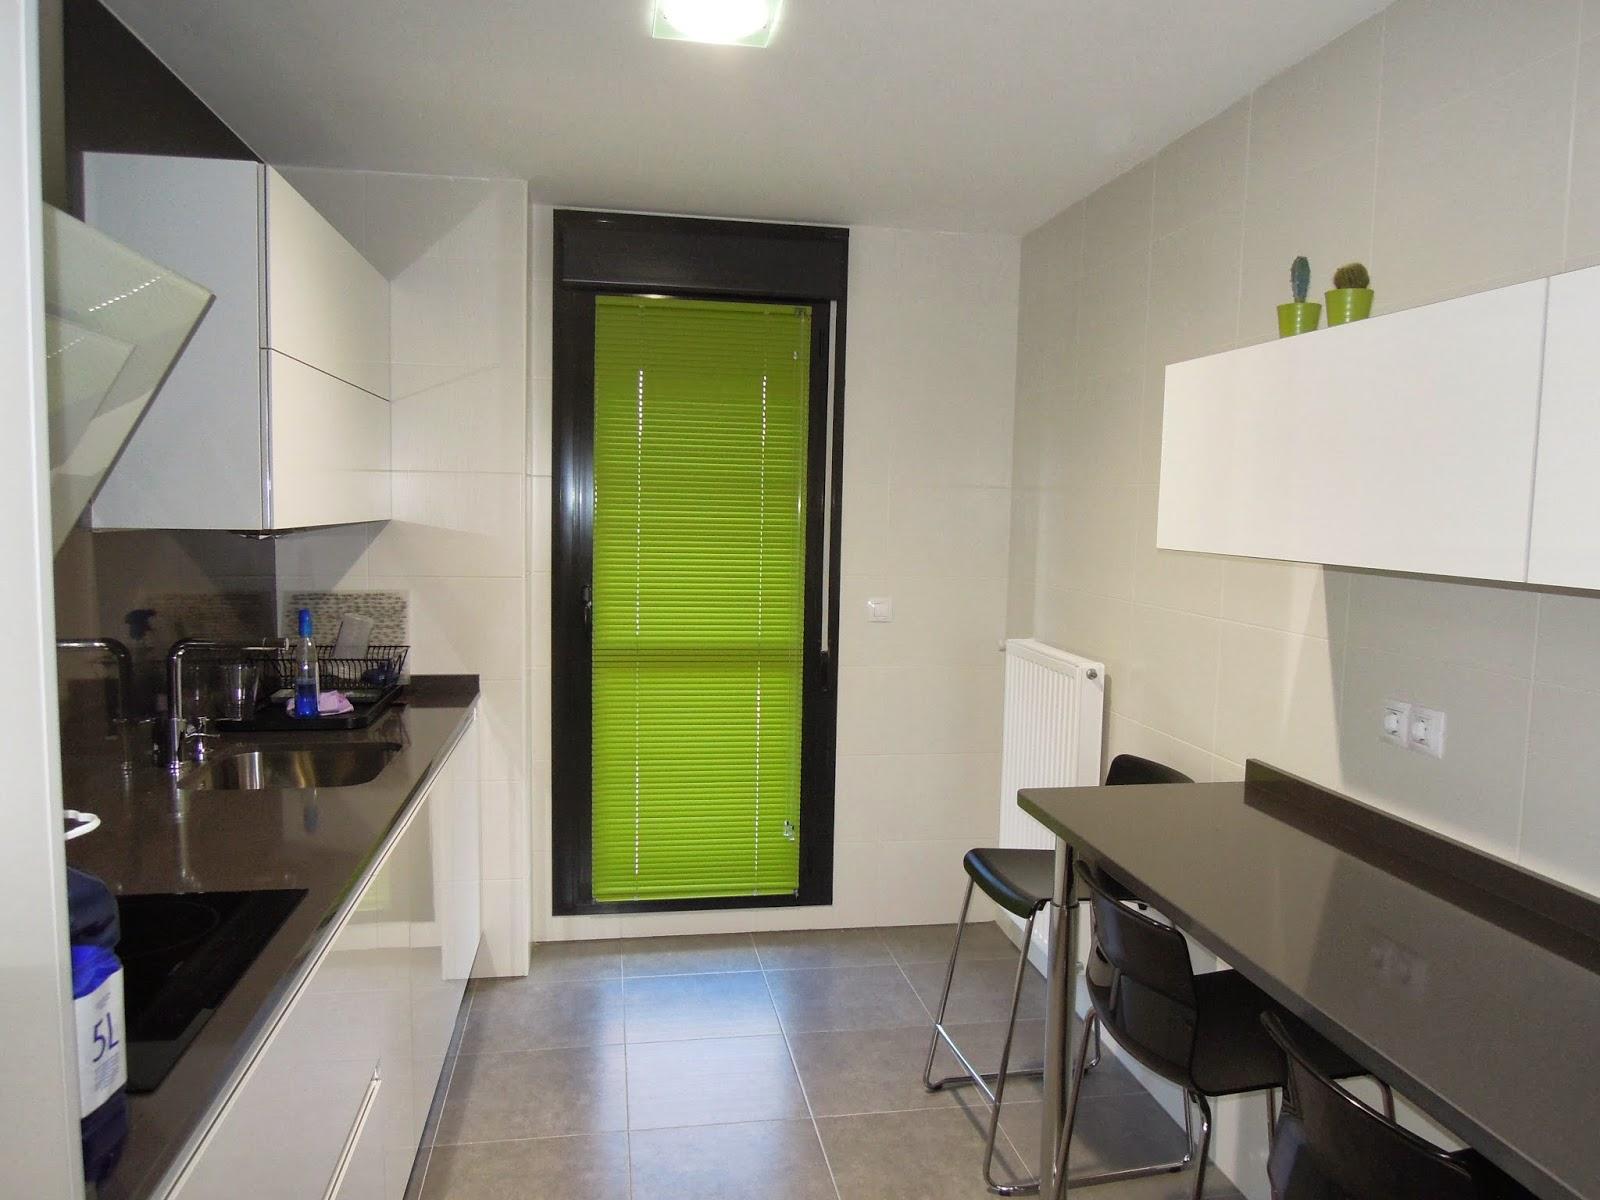 Fotos de cortinas cocinas 2014 - Cortinas cocina puerta terraza ...